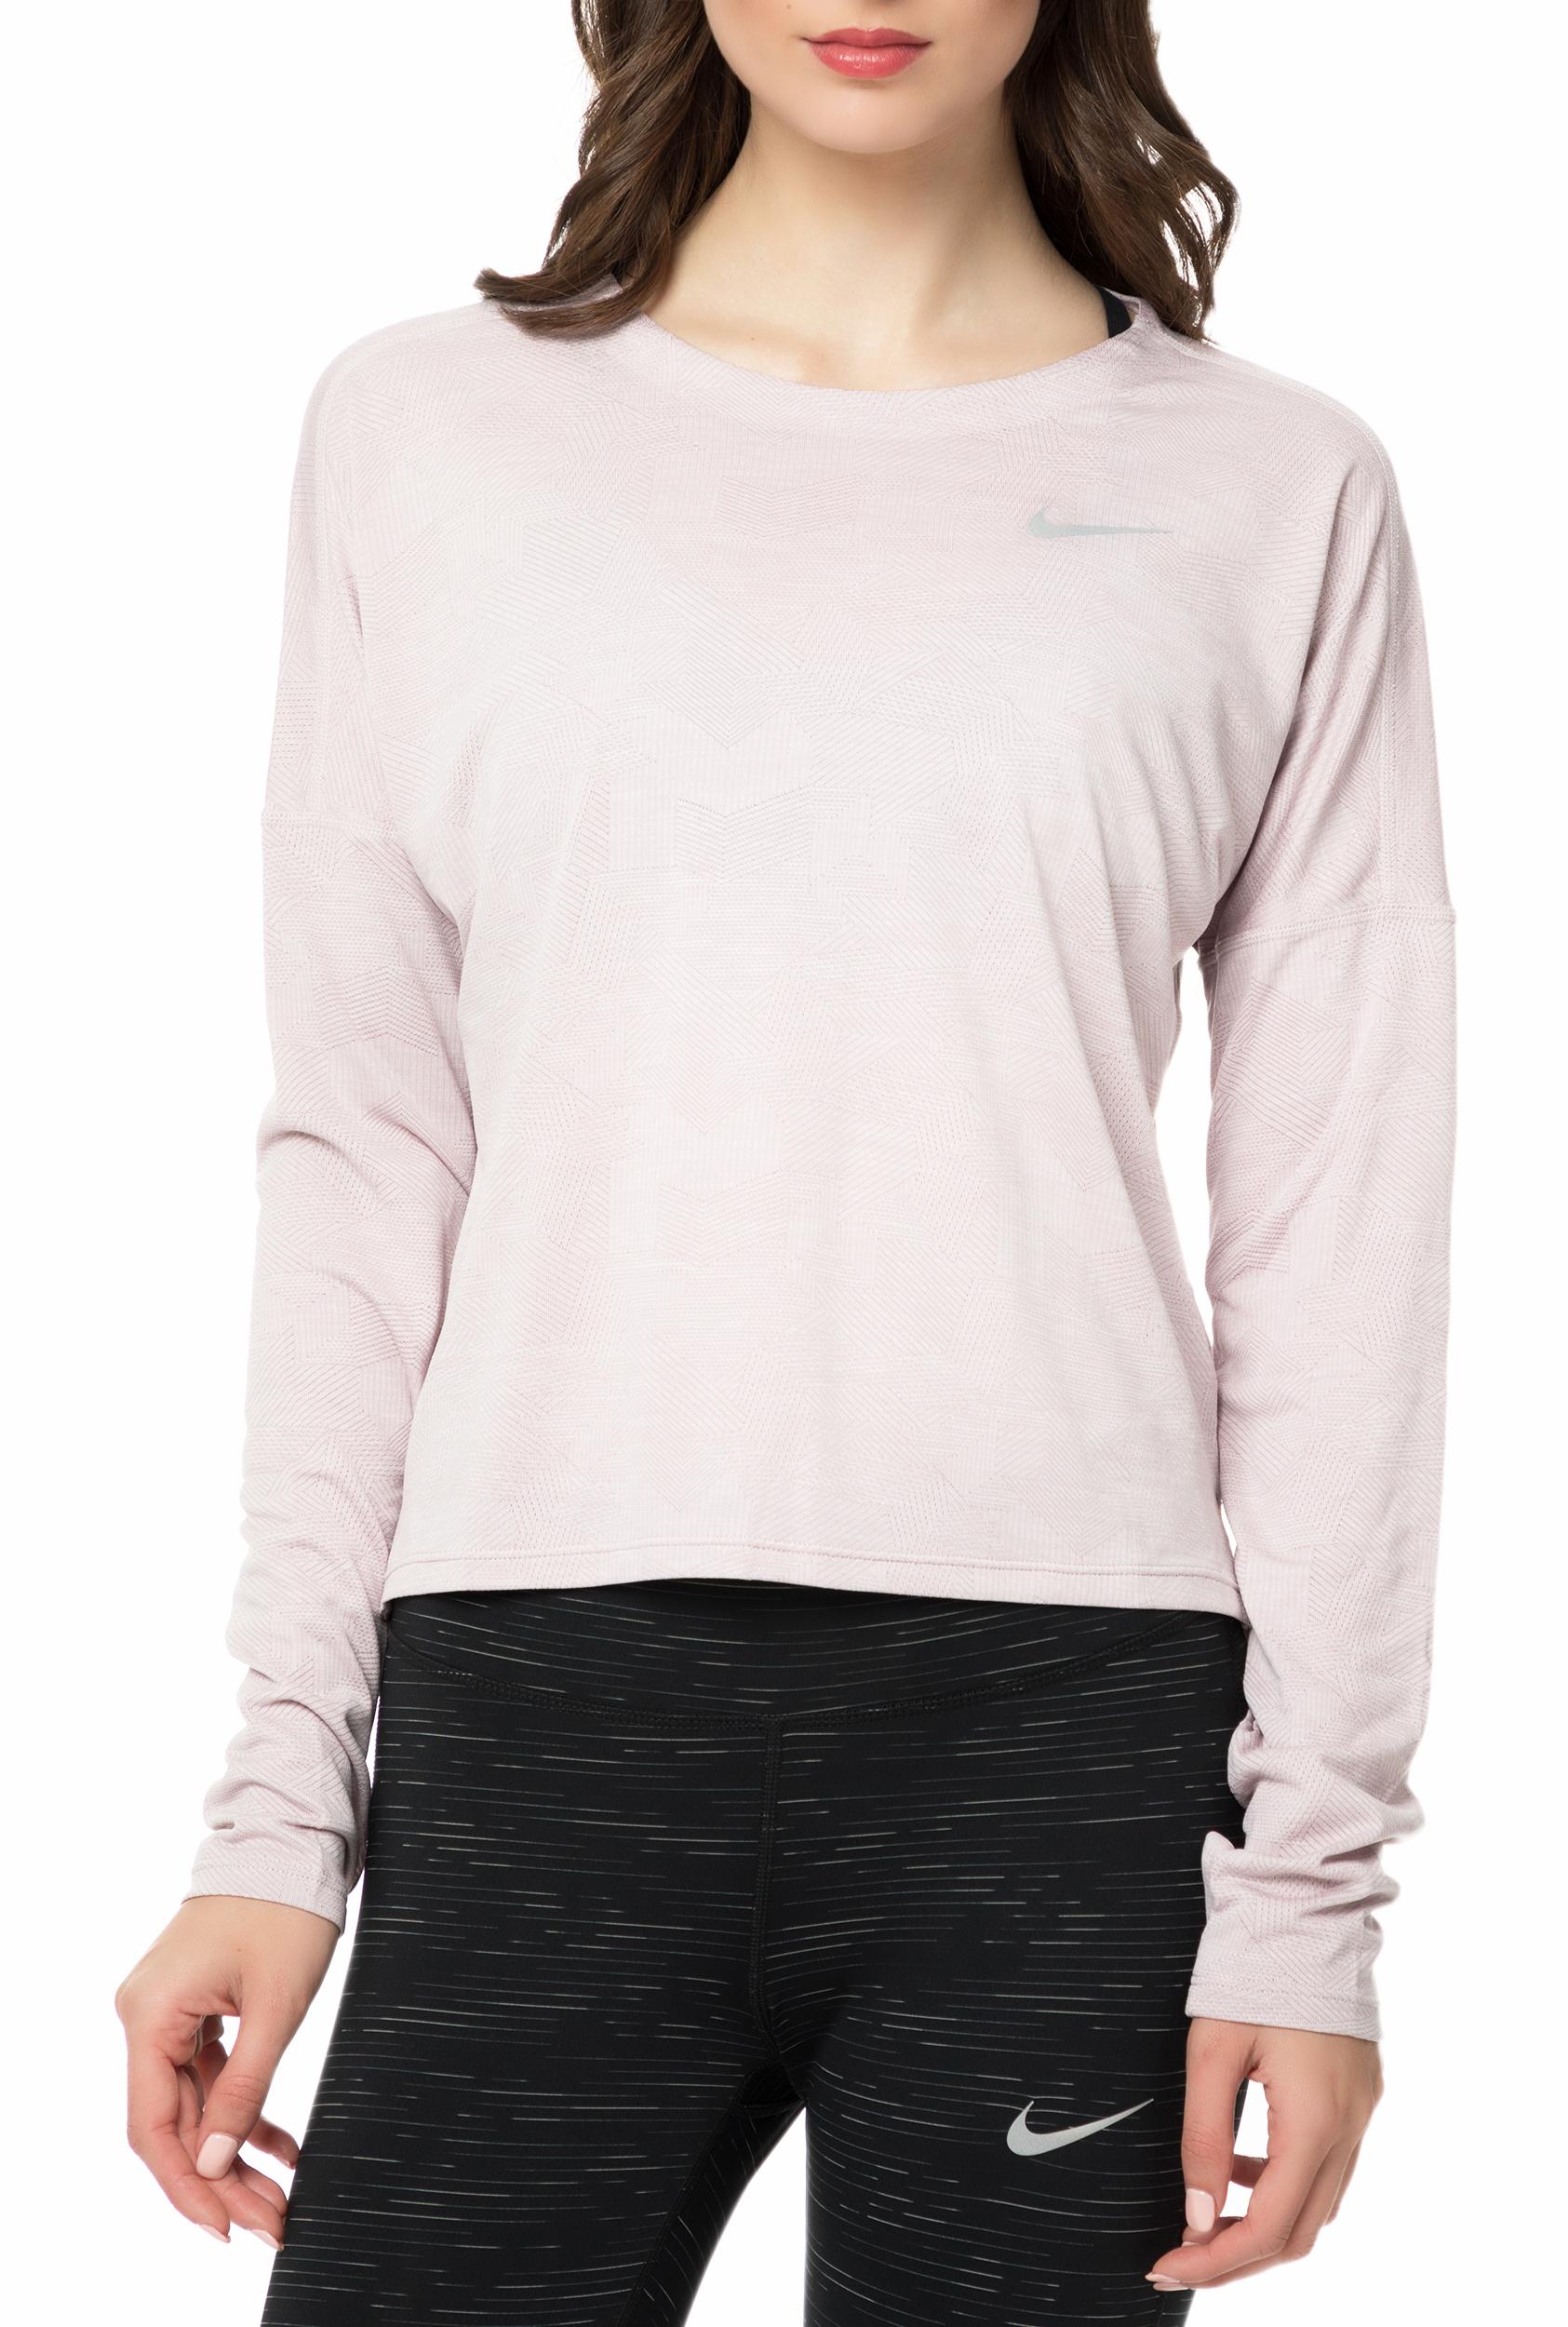 077a1541a5 NIKE - Γυναικεία μακρυμάνικη μπλούζα Nike DRY MEDALIST ροζ